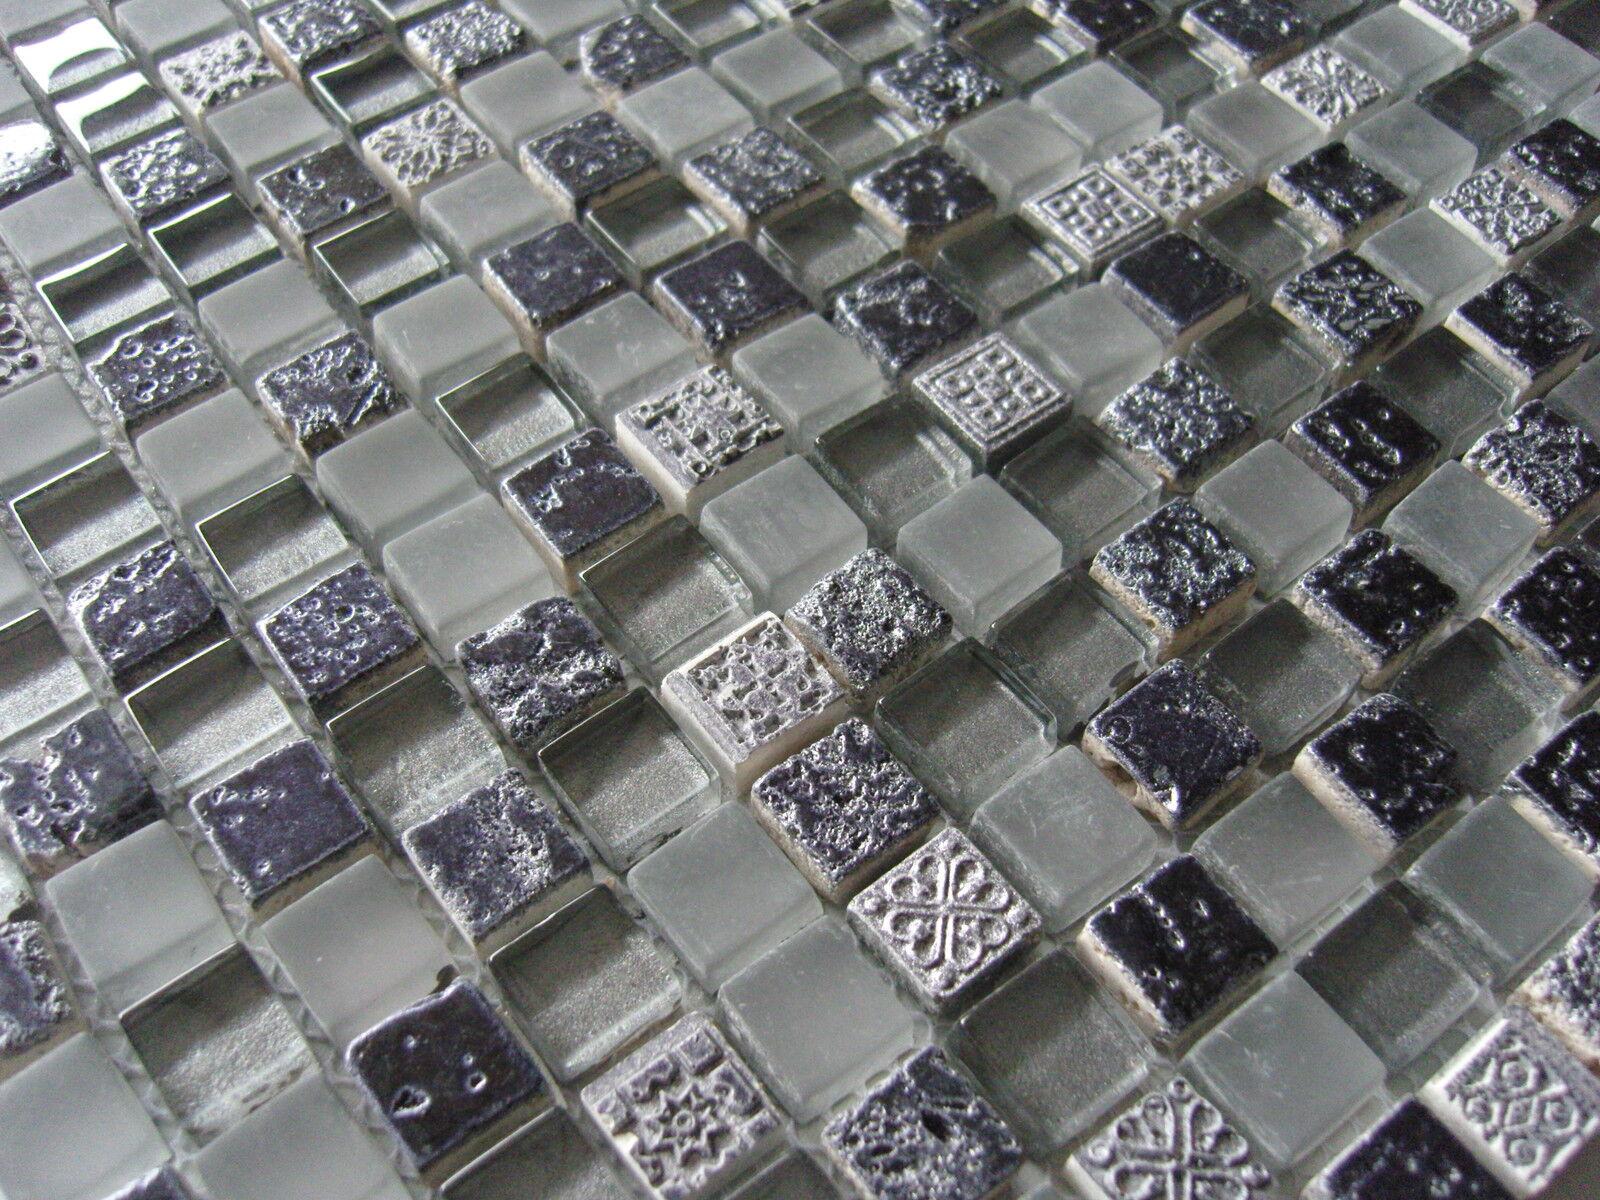 glasmosaik mosaik fliesen klarglas ornament schwarz silber grau aztek 15x15 eur 12 95. Black Bedroom Furniture Sets. Home Design Ideas